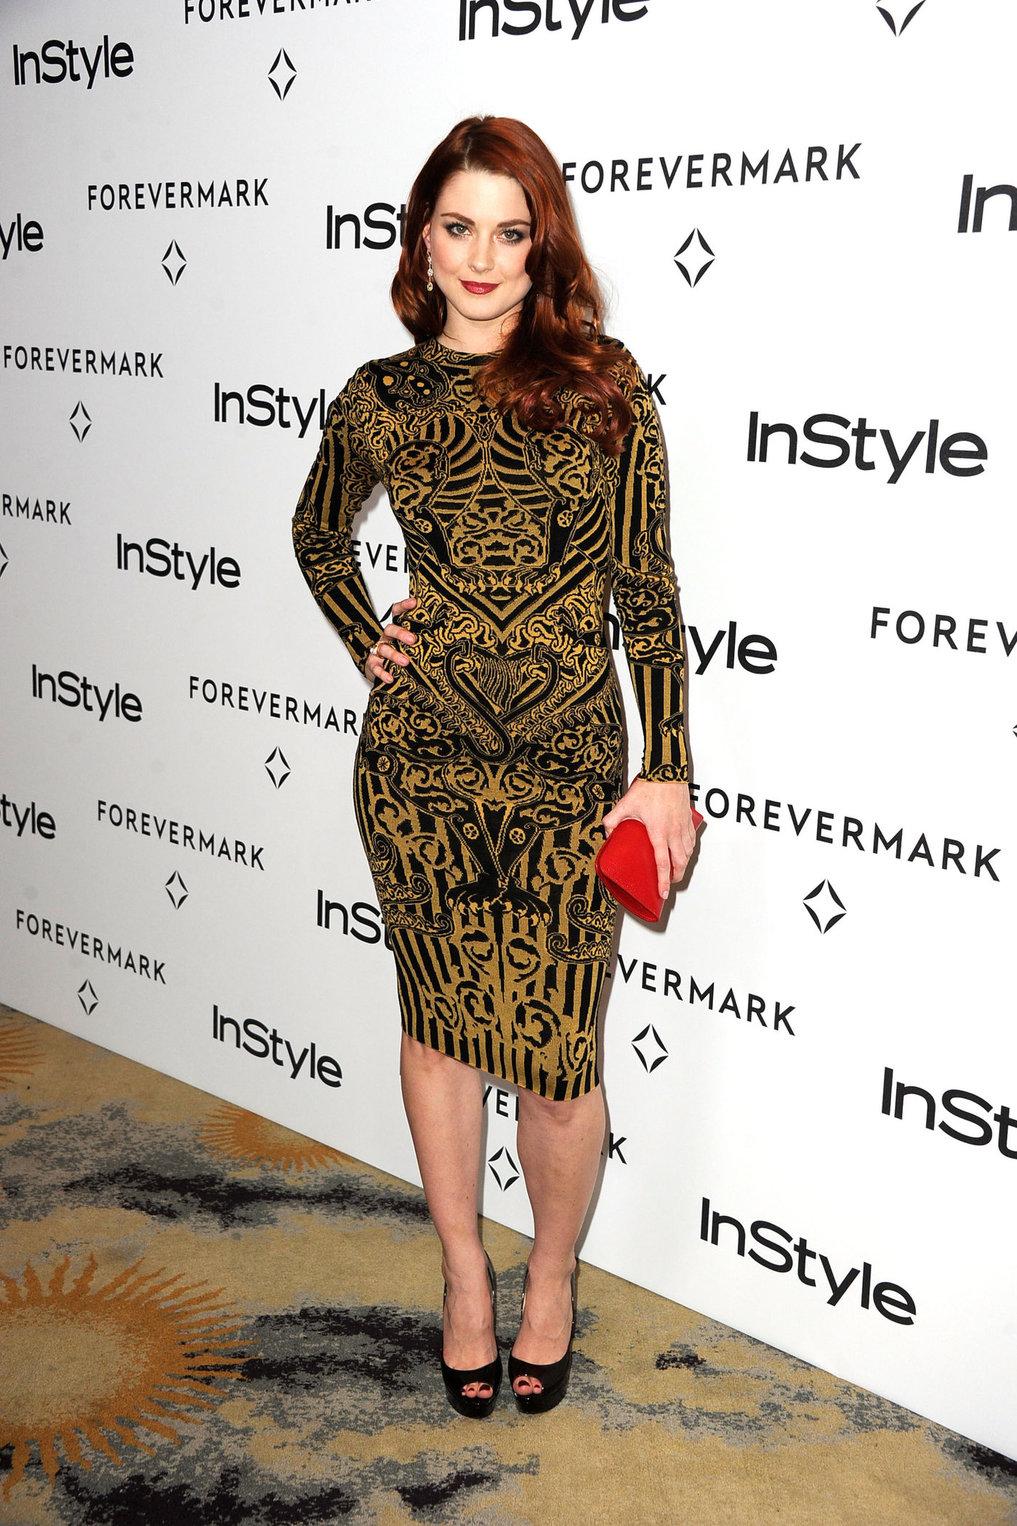 Alexandra Breckenridge Forevermark and Instyle Golden Globe event on January 10, 2012